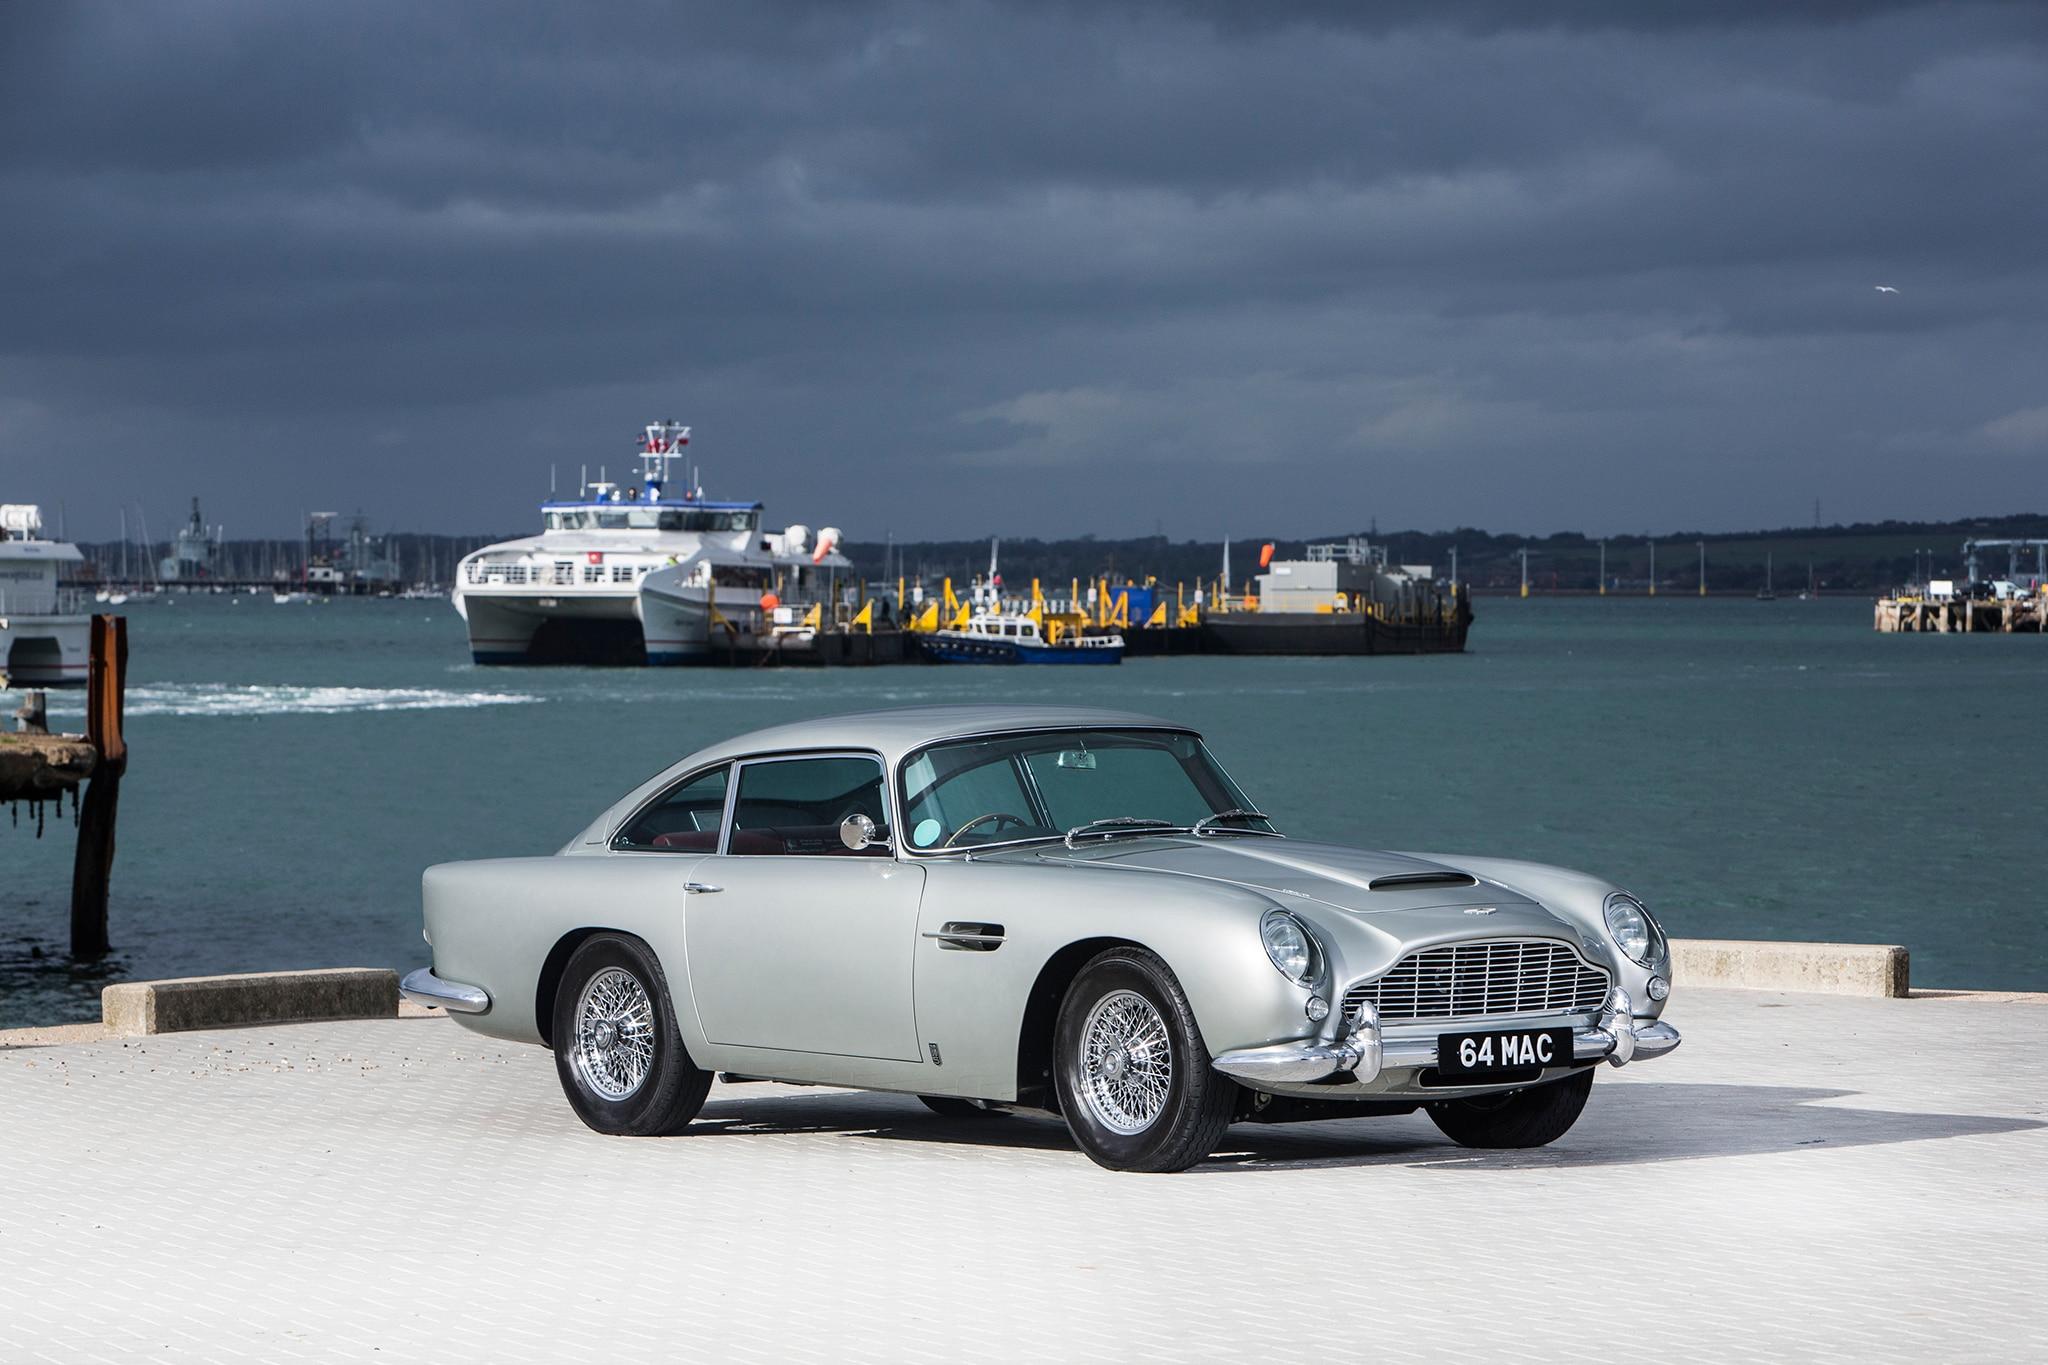 Bonhams To Auction Ex Paul Mccartney Aston Martin Db5 And